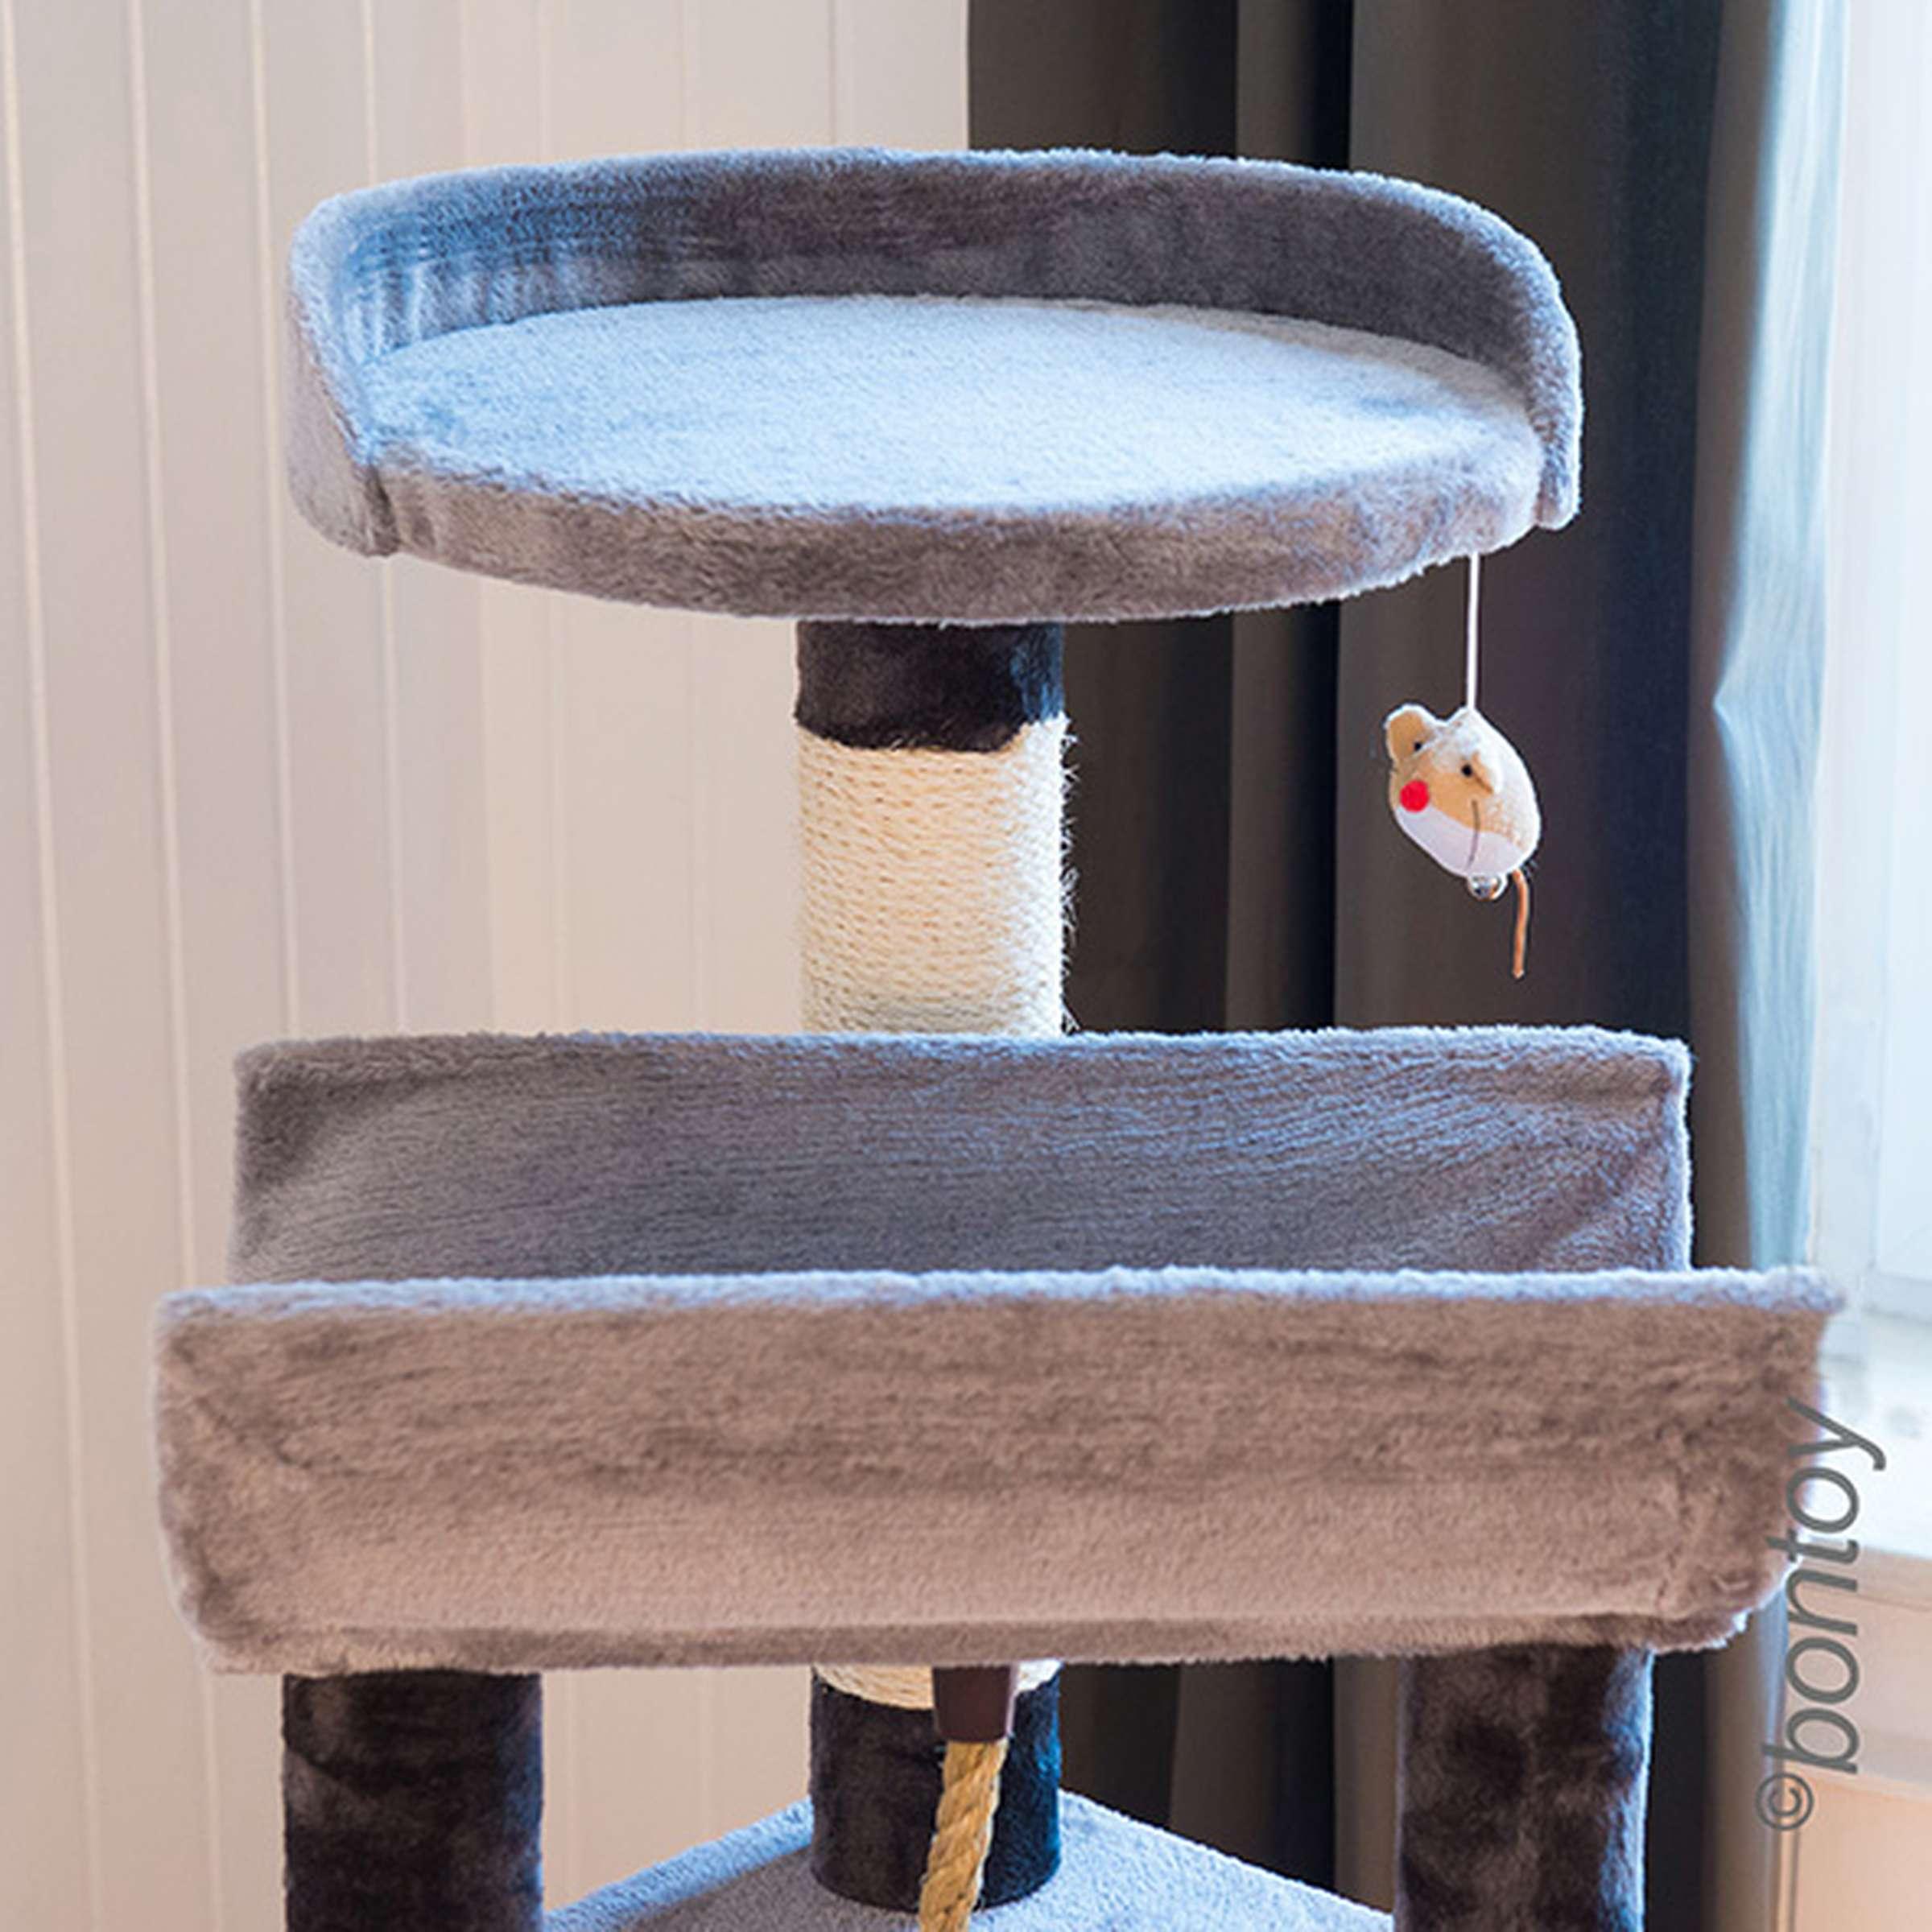 kratzbaum lou grau 145 cm mit gro er liegefl che 69 90. Black Bedroom Furniture Sets. Home Design Ideas